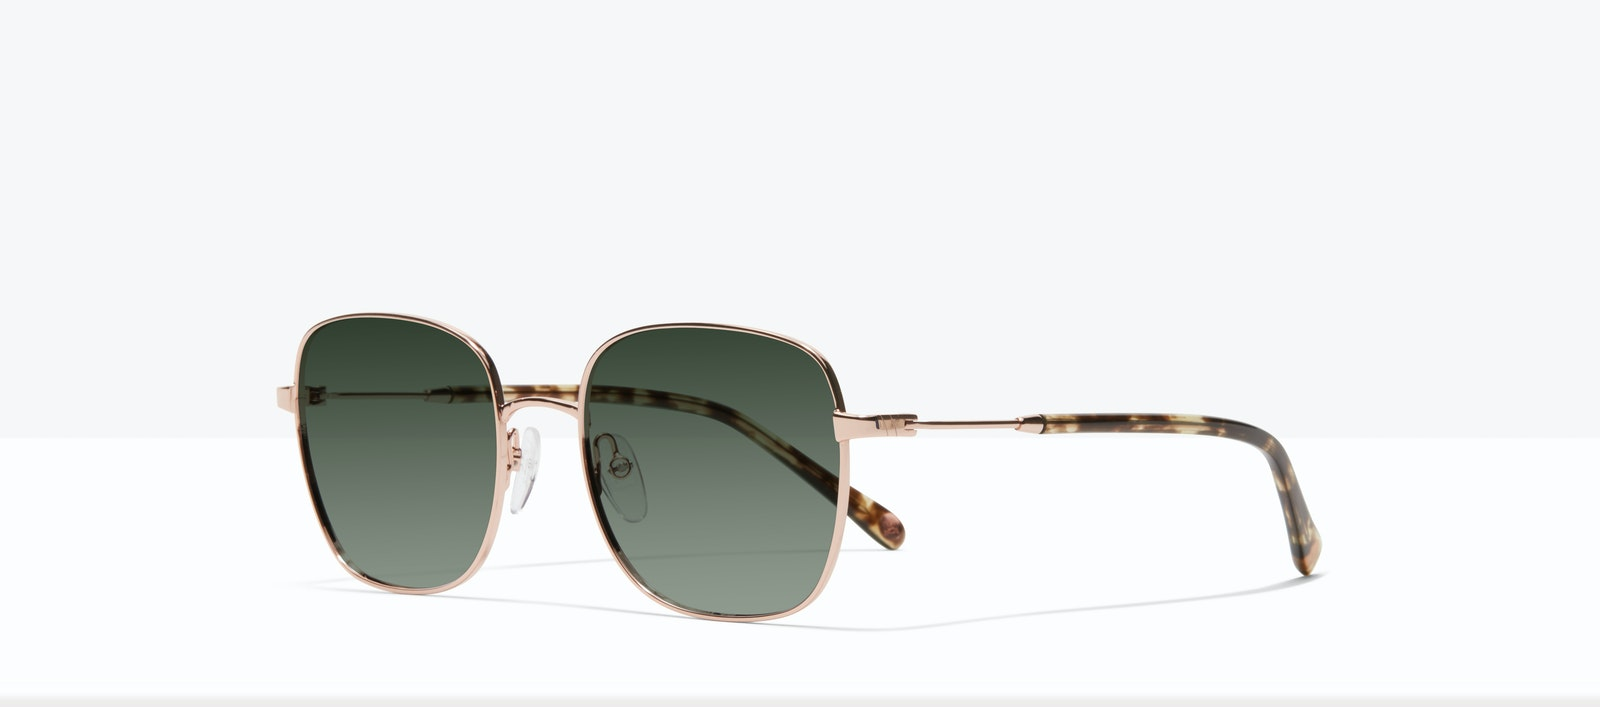 Affordable Fashion Glasses Square Sunglasses Women Henriette M Rose Gold Tilt